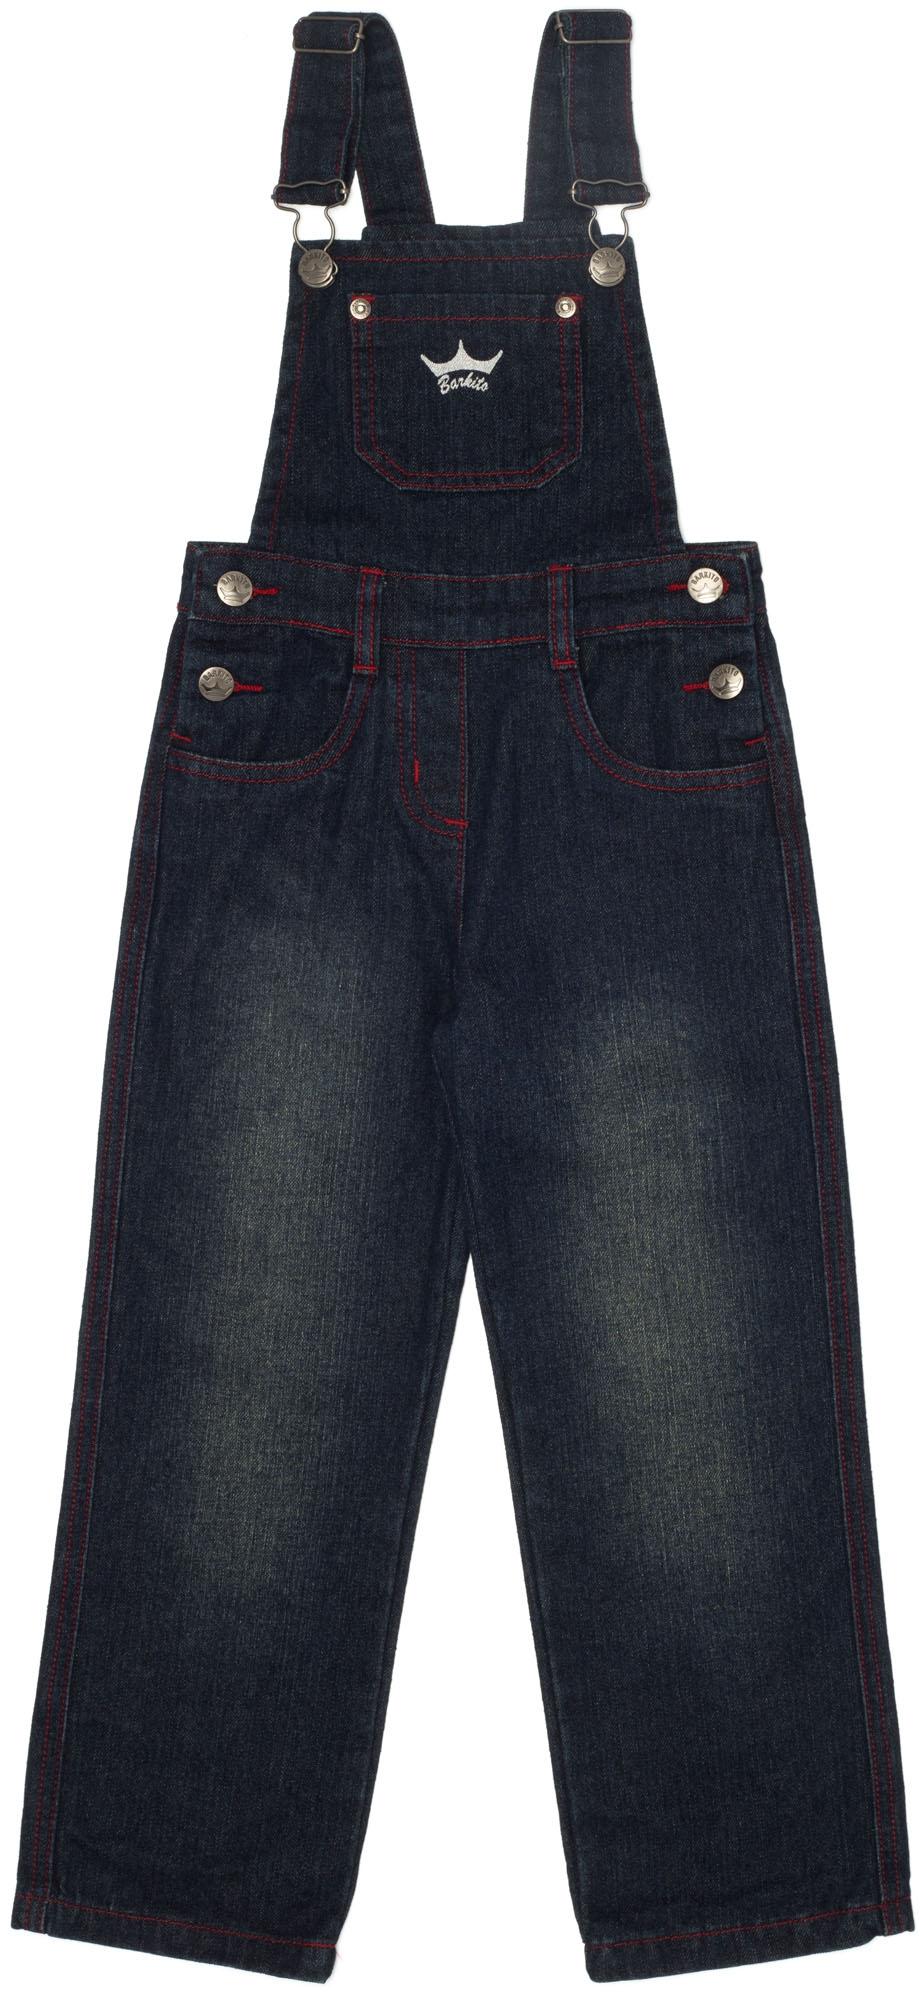 Полукомбинезоны Barkito Полукомбинезон джинсовый для девочки Рок-н-ролл Barkito синий полукомбинезоны для новоржденных